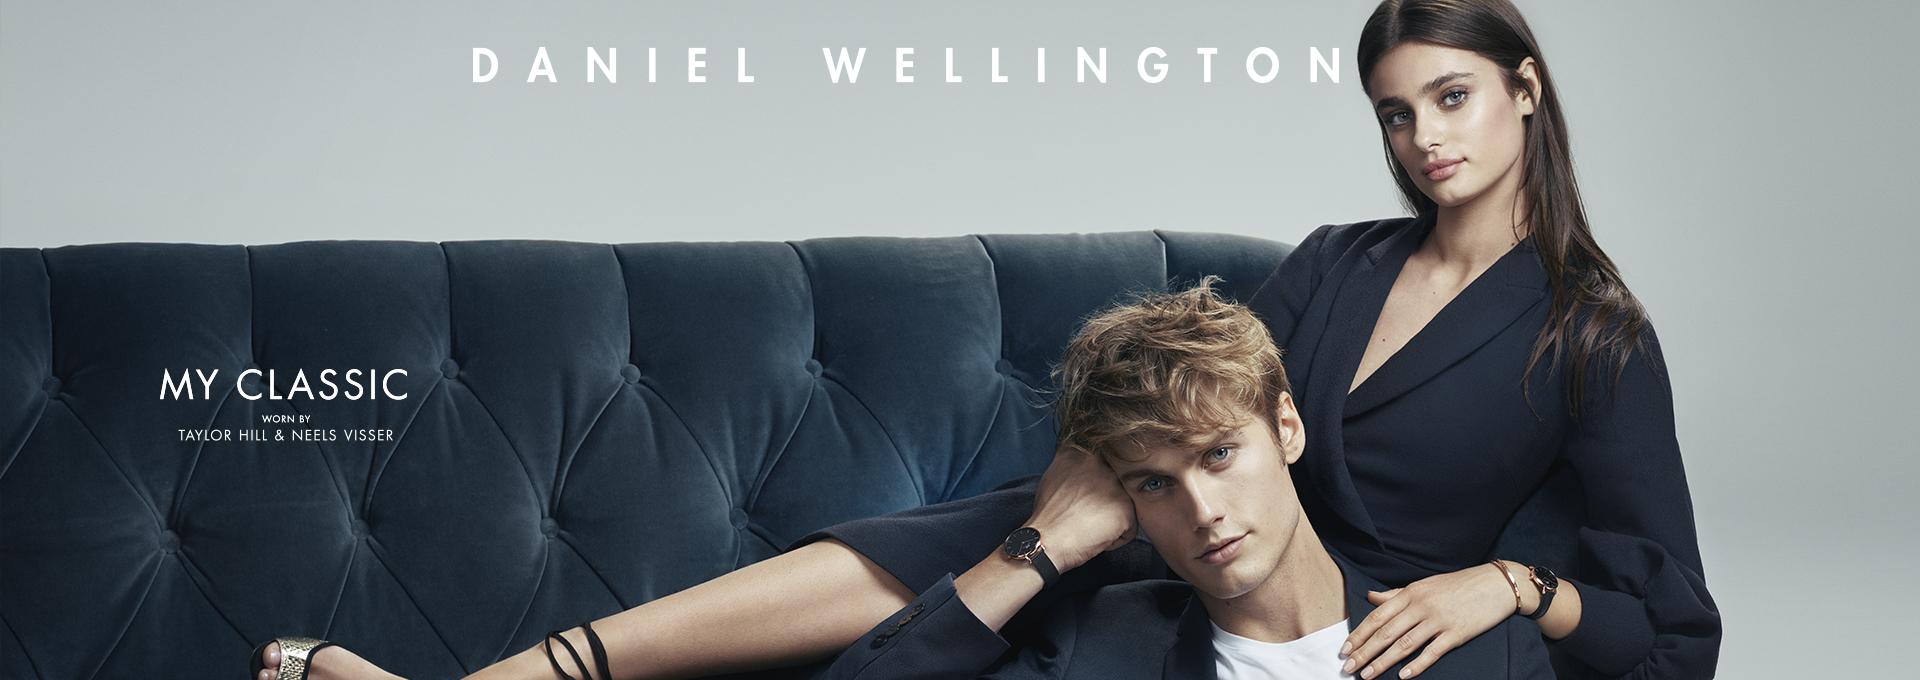 Daniel Wellington - Orologi - Punto vendita - Gioielleria Casavola Noci